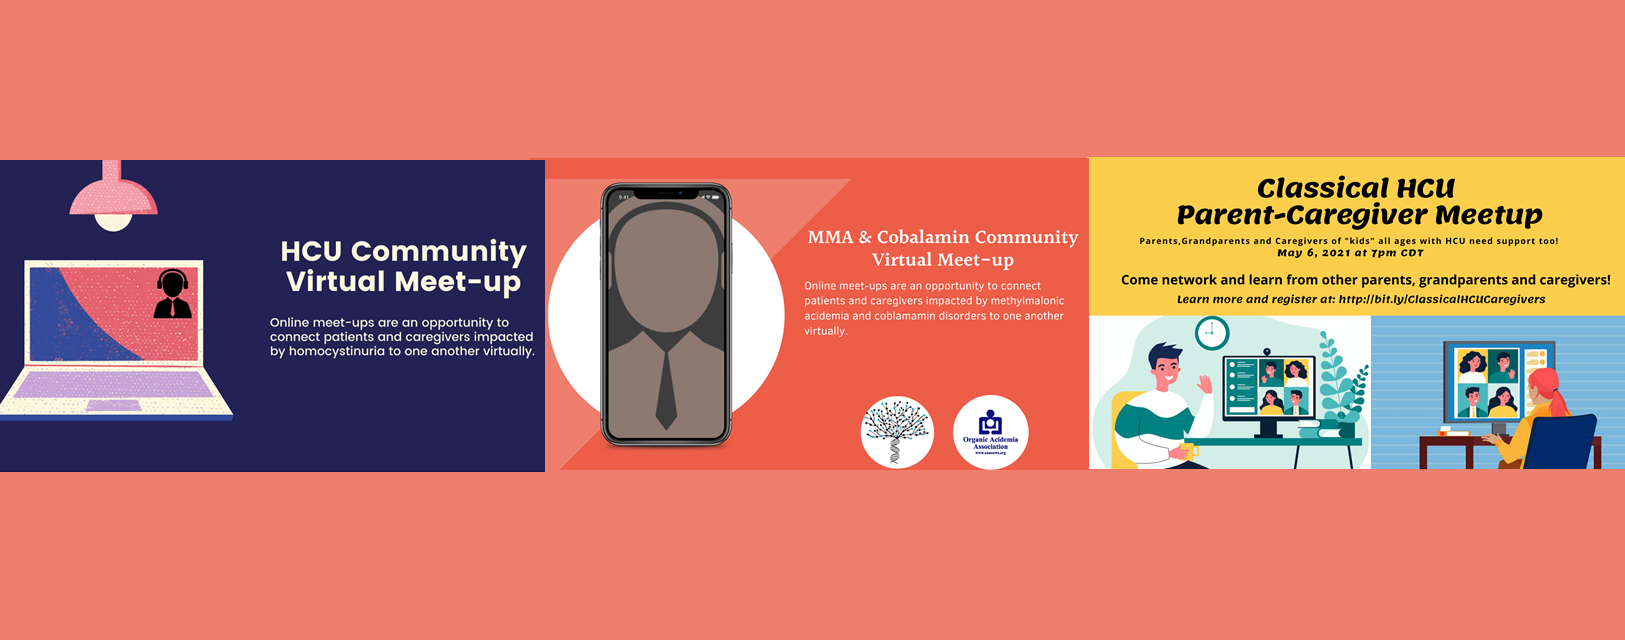 Community Virtual Meet-ups